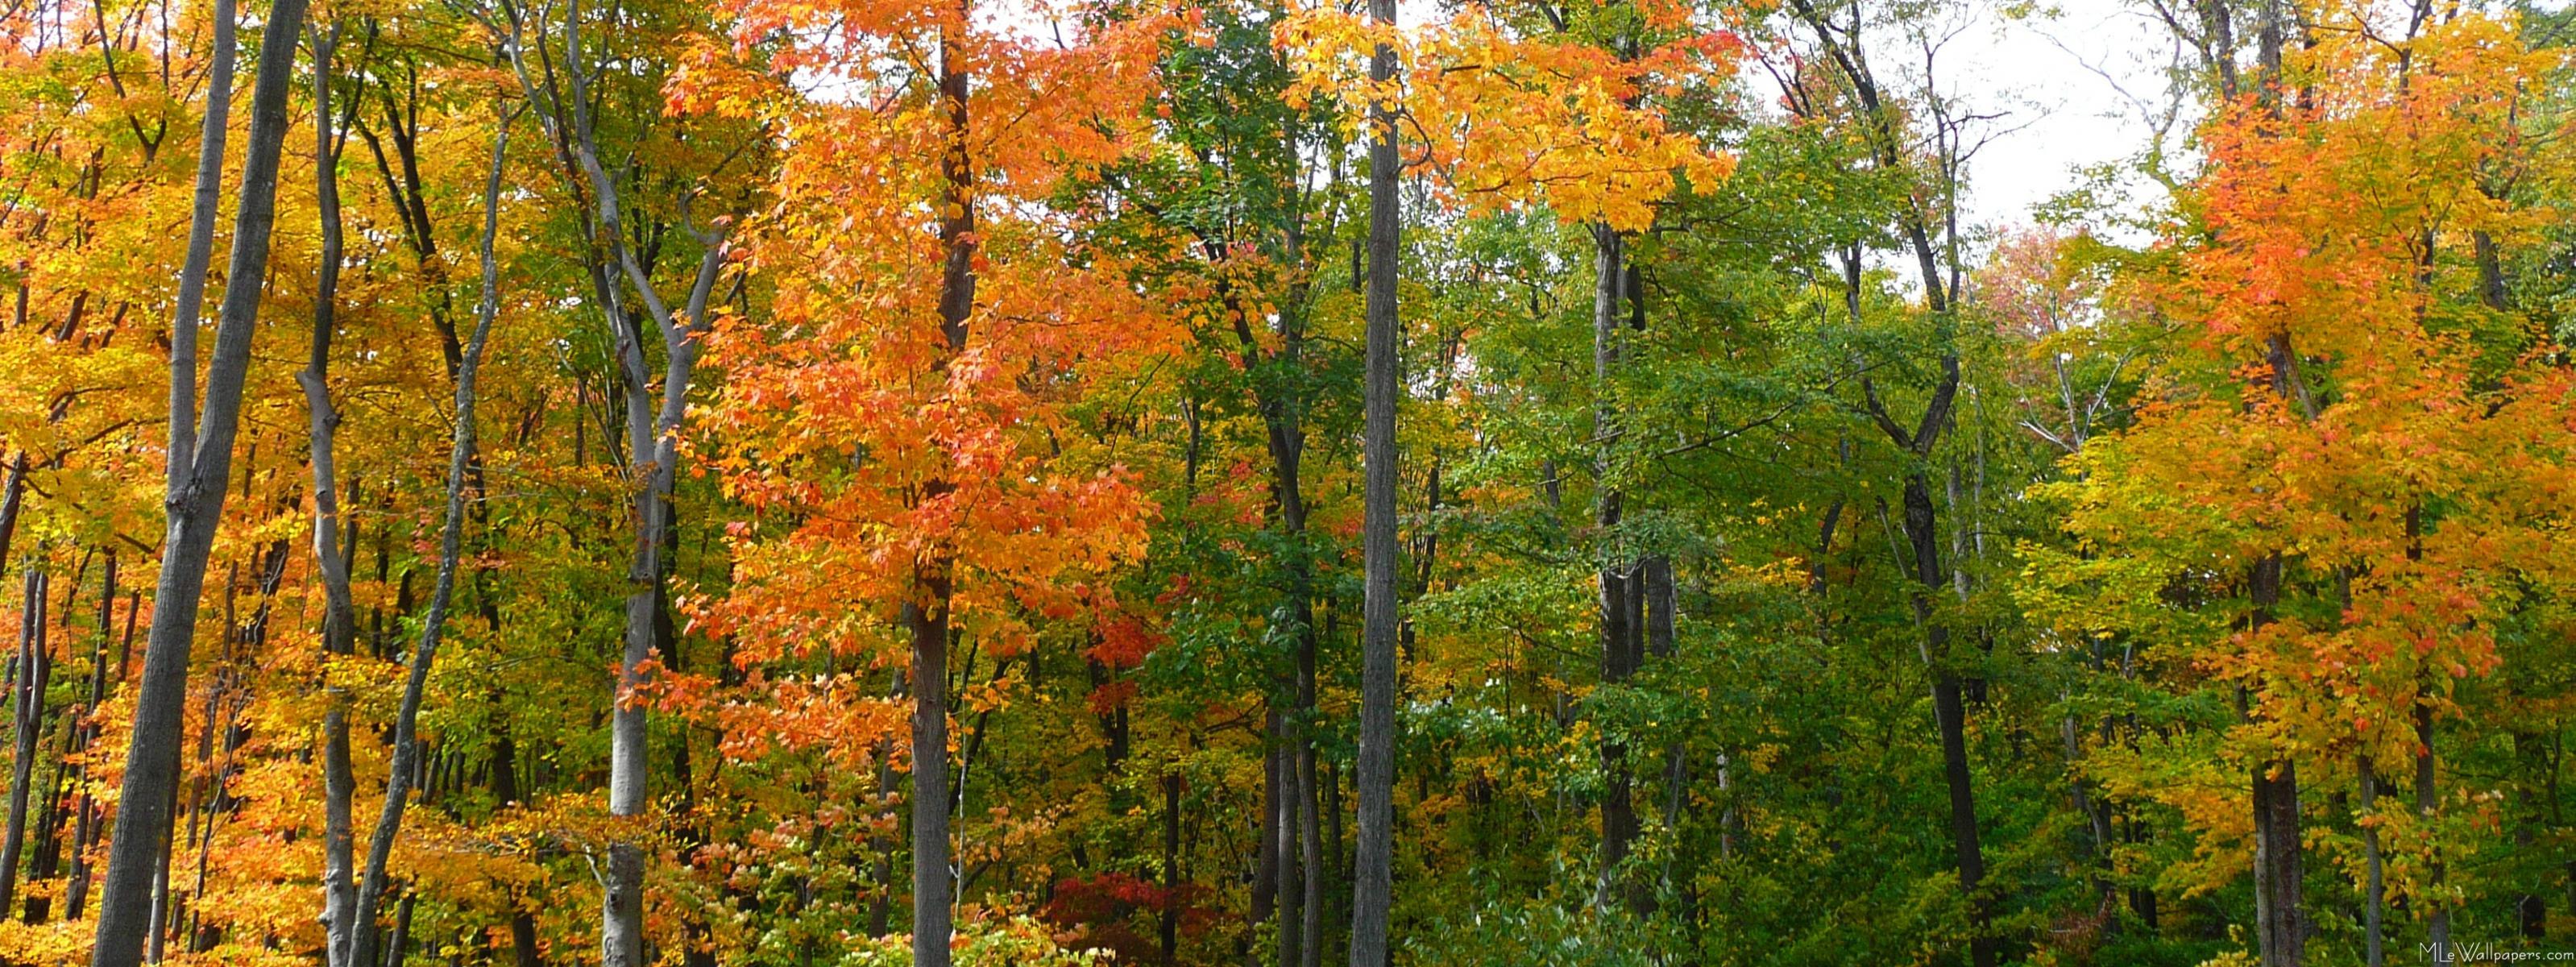 Maple Trees TreePicturescom 3678284 - iyashi-top.info